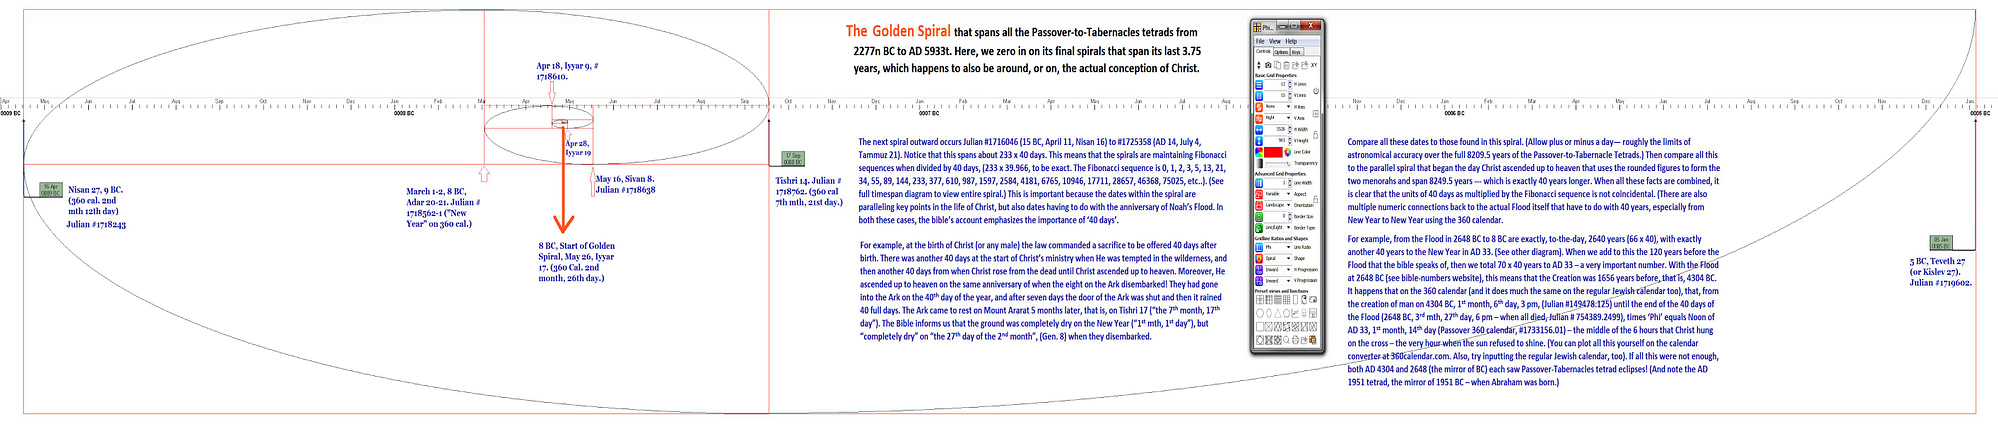 Phi- Golden Spiral Zeroed in on Christ's Death.